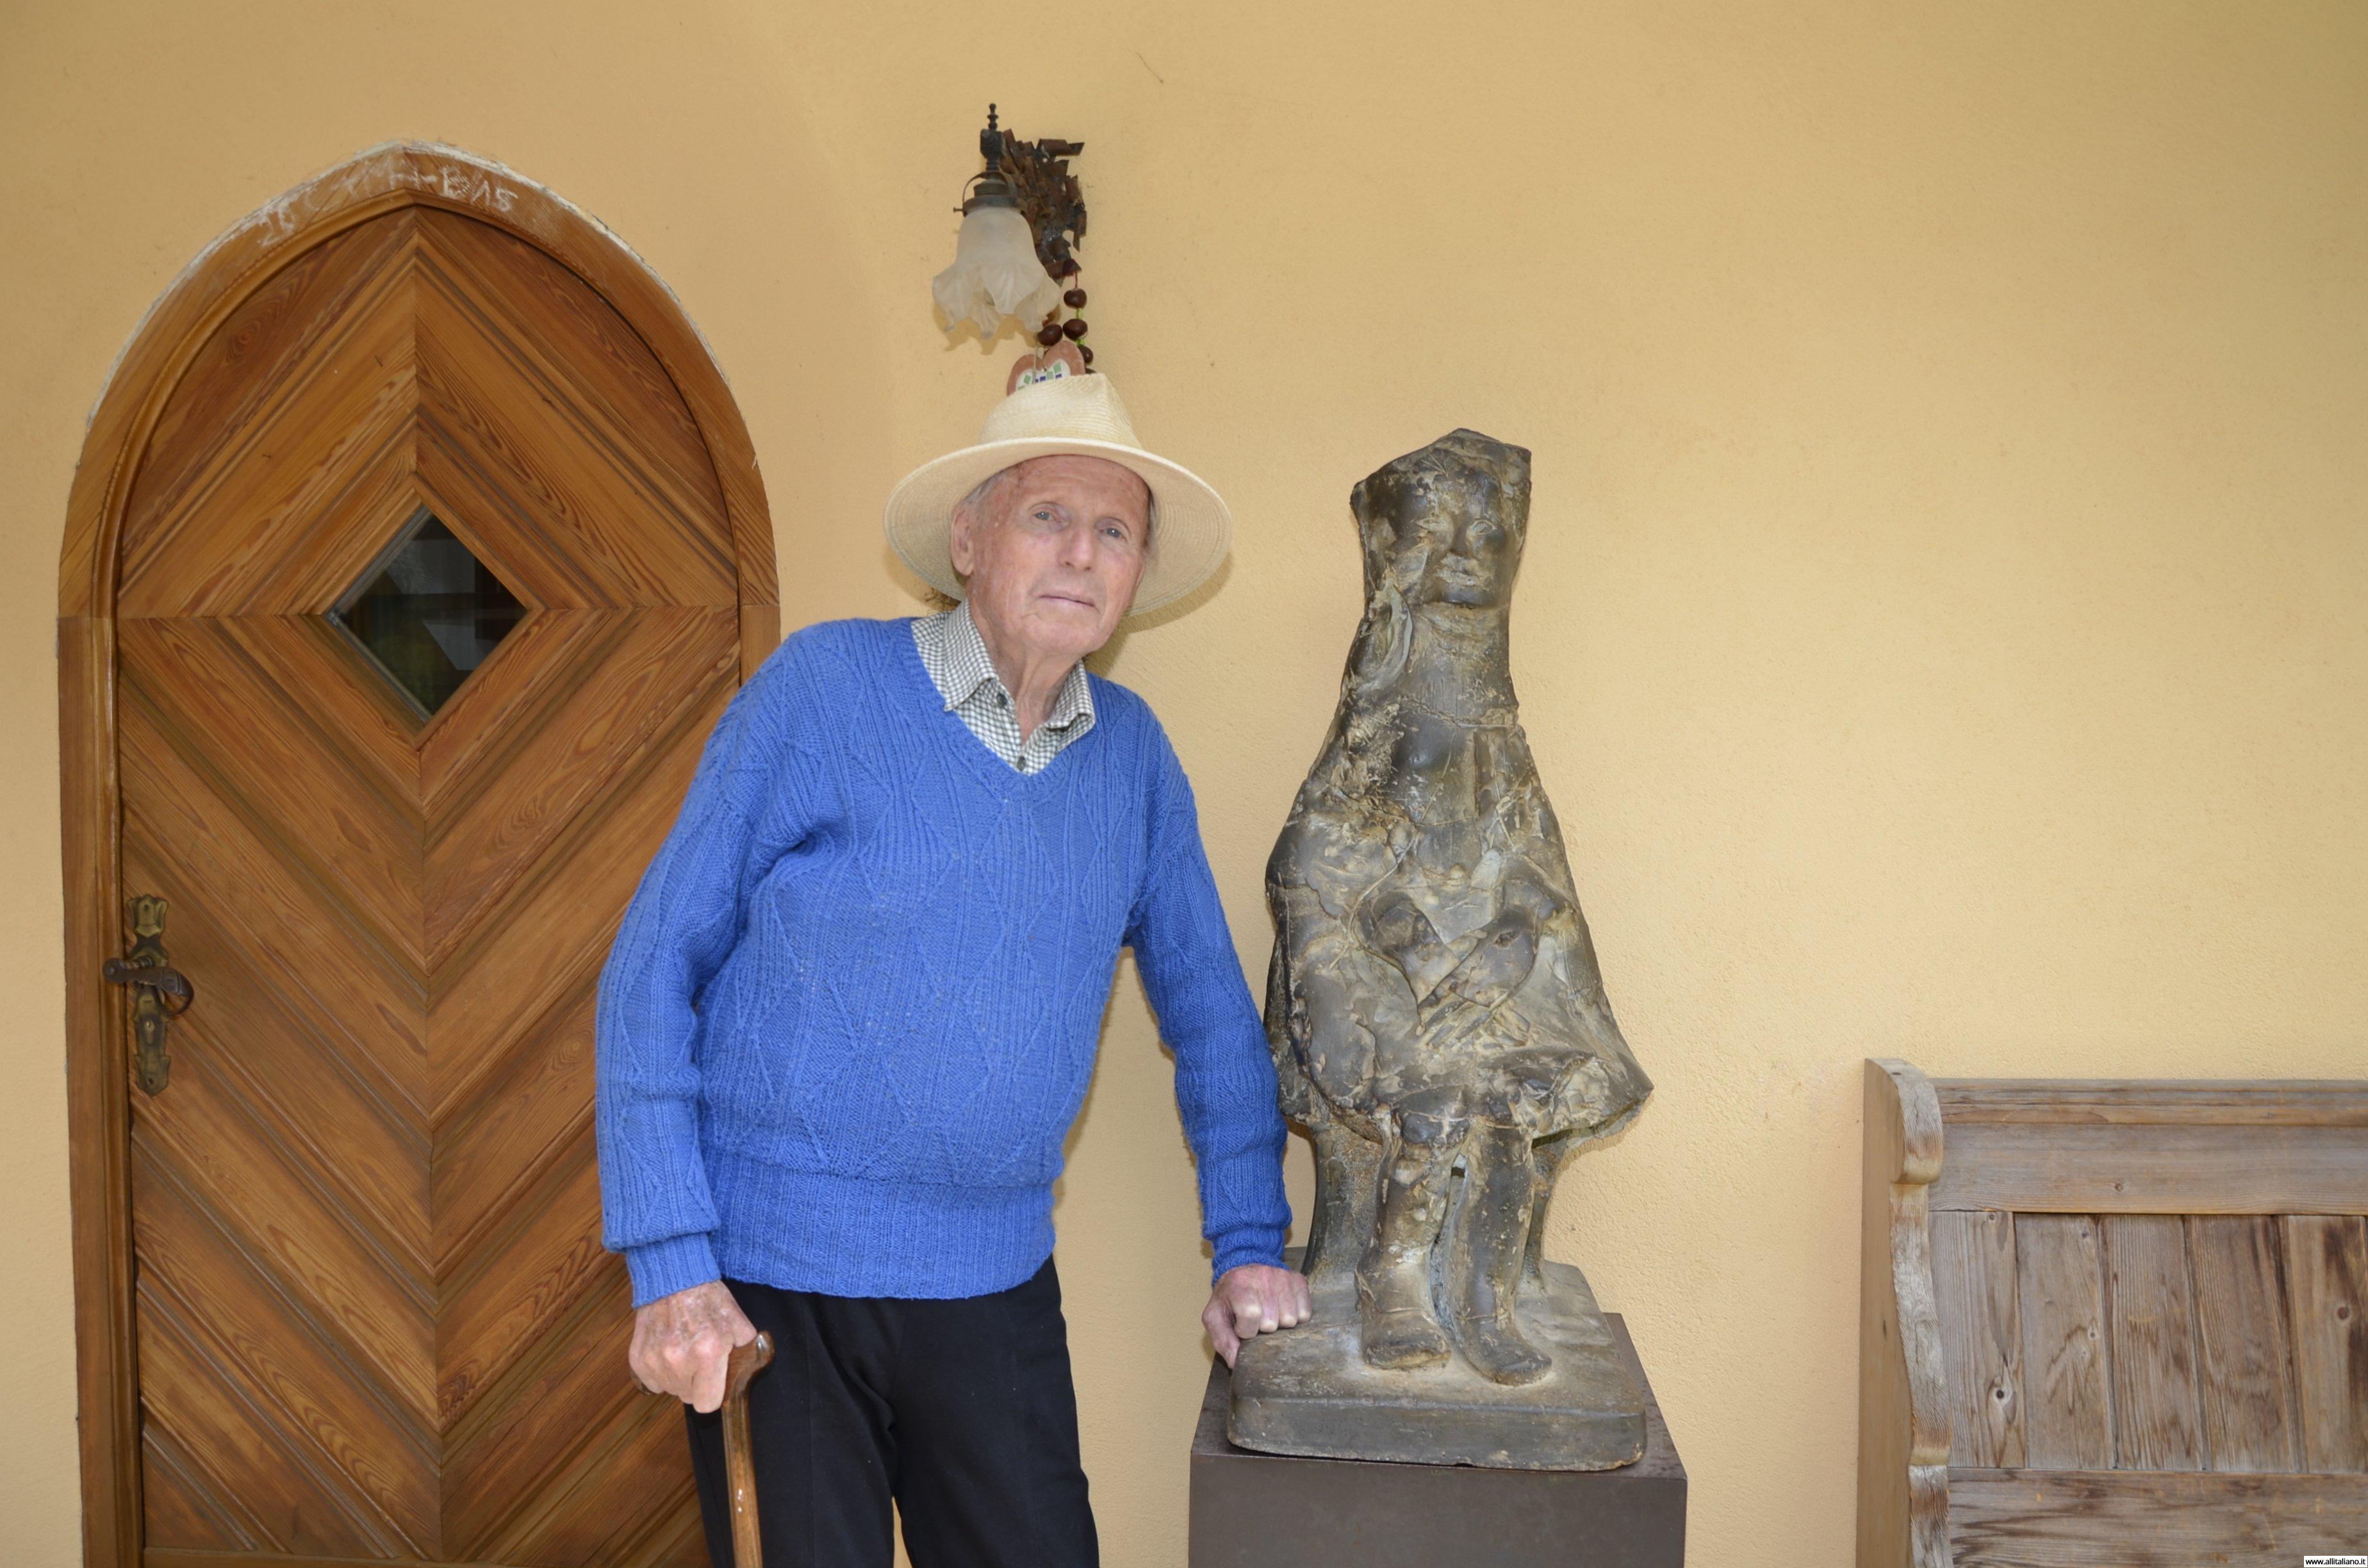 italy-alto-adige-suedtirol-josef-kostner-sculptur-groeden-gardena-svetlana-konobella (7)